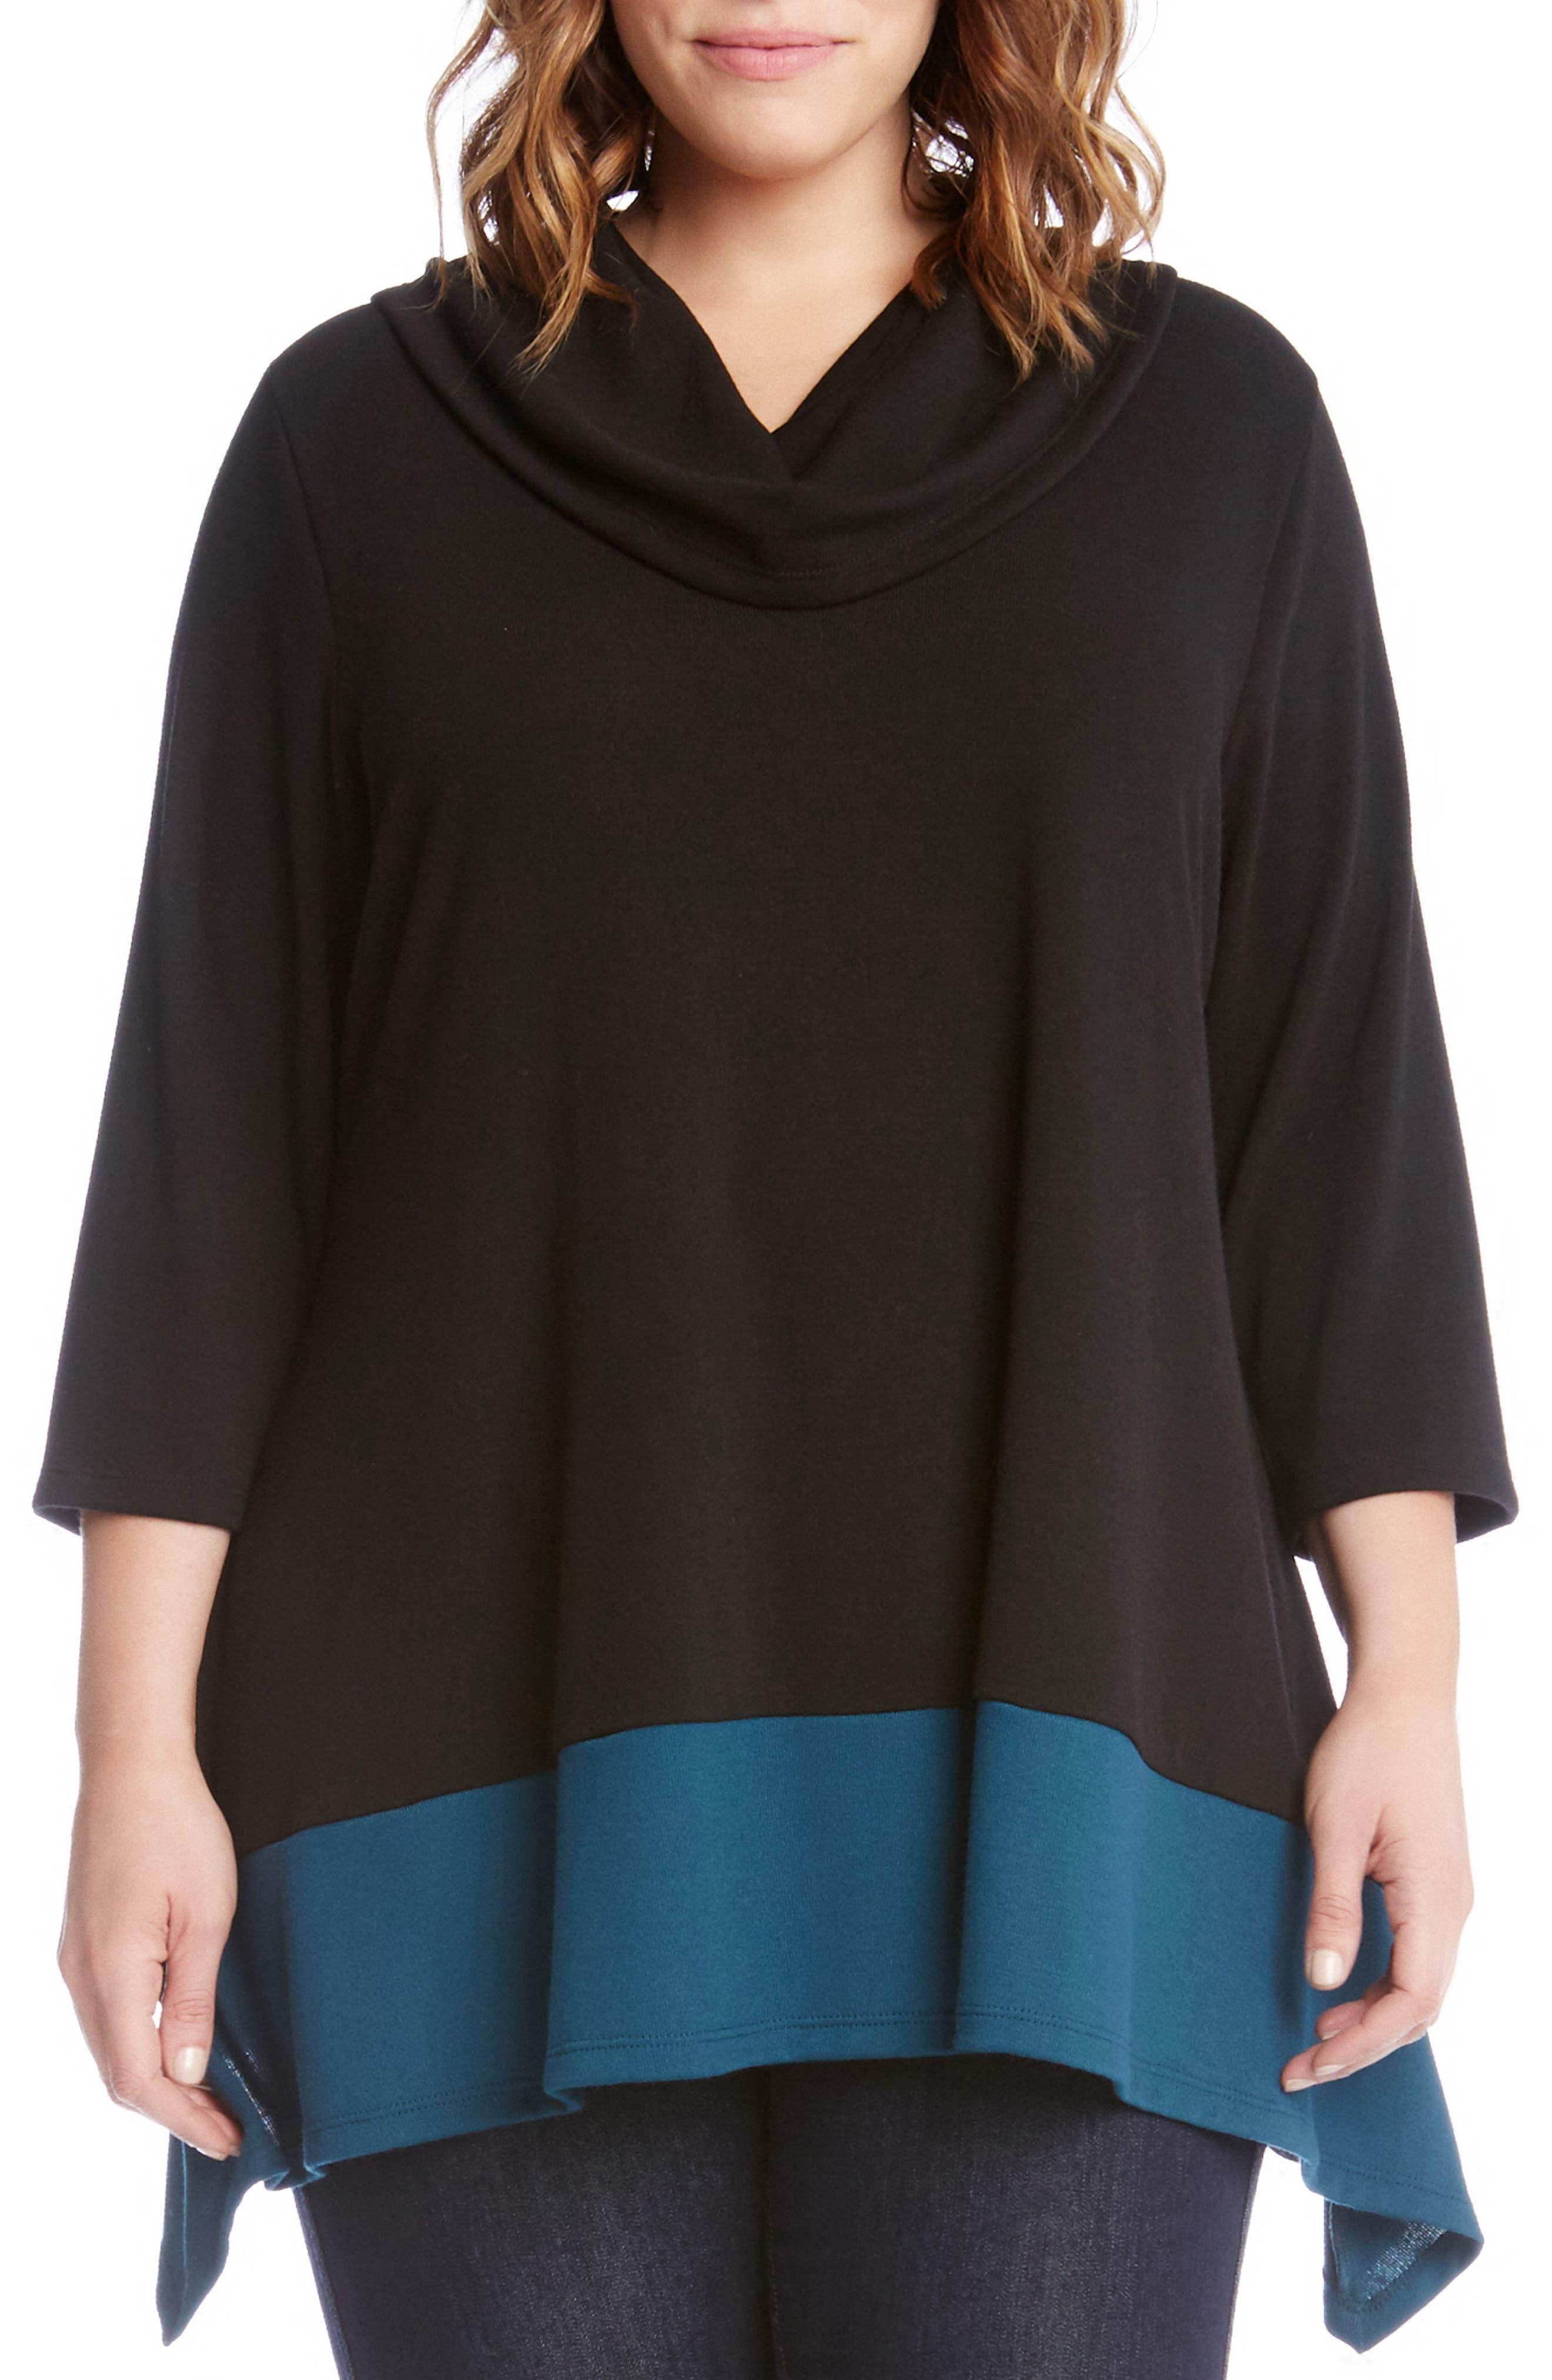 Alternate Image 1 Selected - Karen Kane Colorblock Hem Sweater (Plus Size)